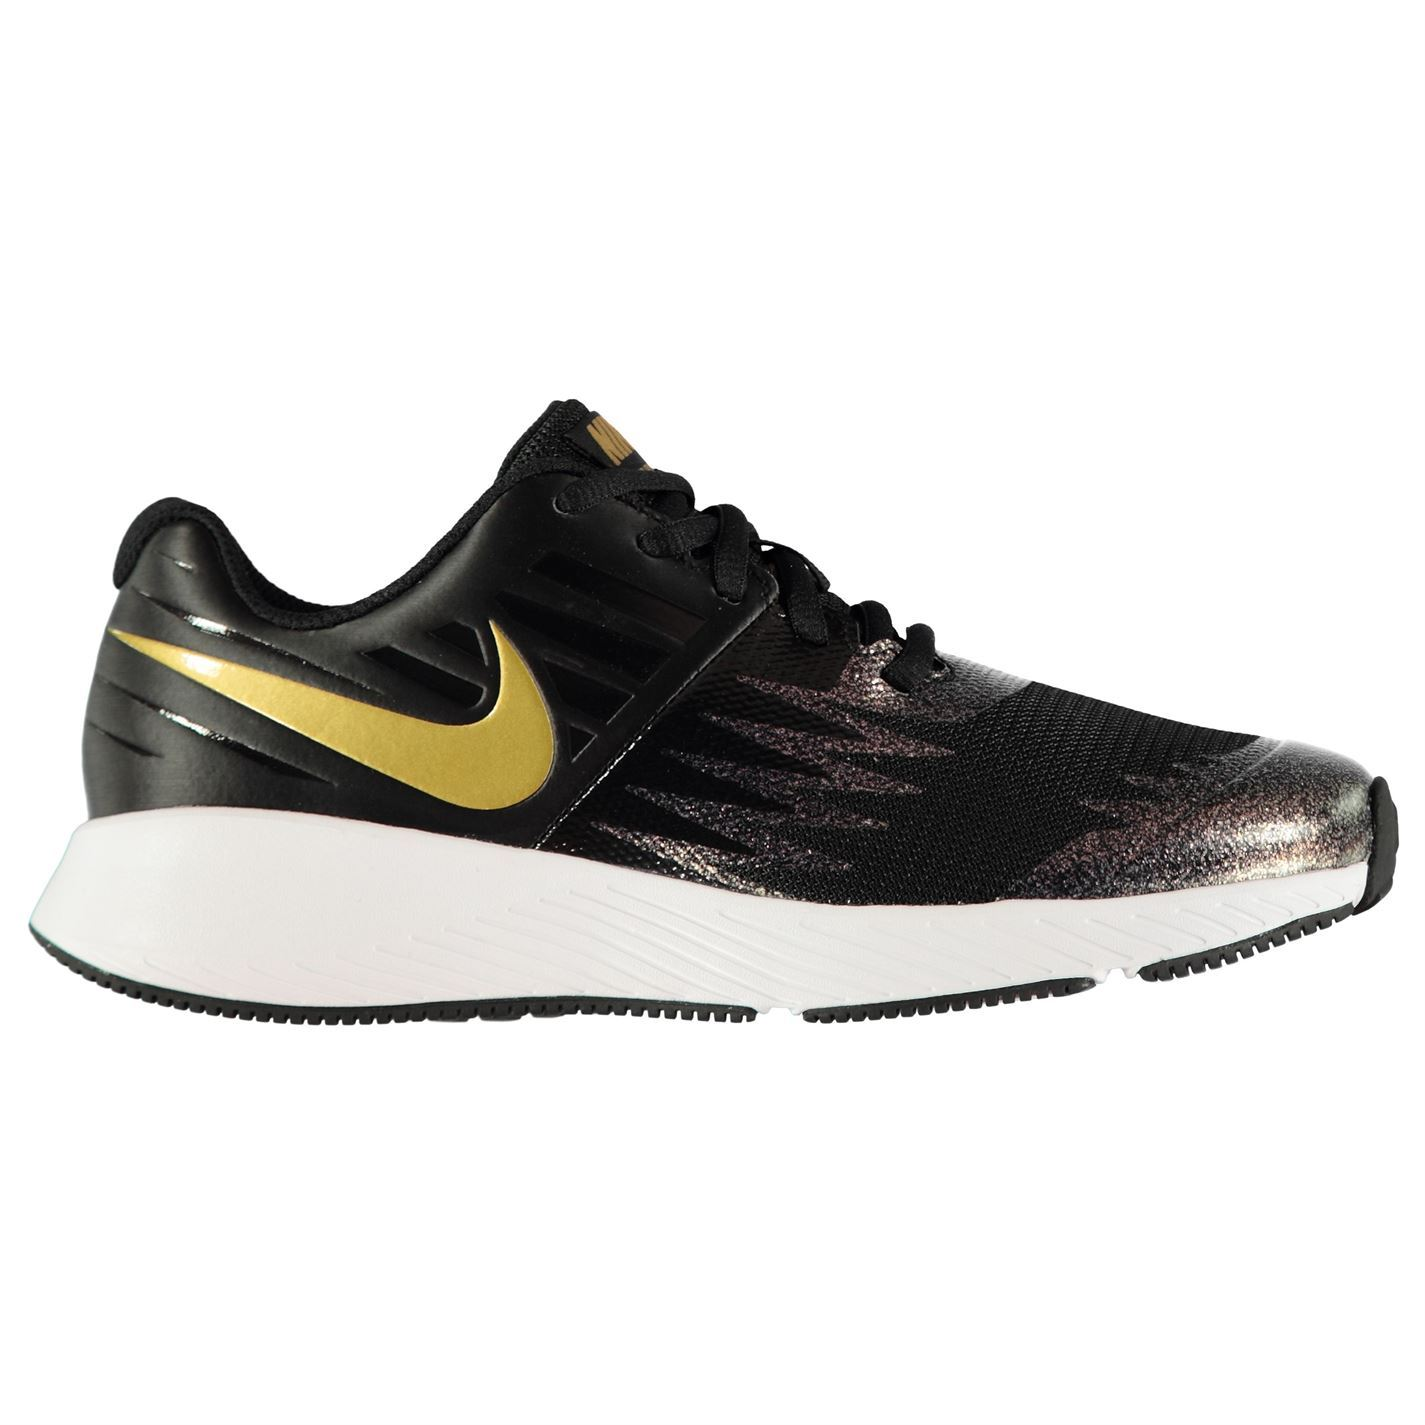 ... Nike Star Run Junior Girls Trainers Black Gold Shoes Footwear ... b0425143b